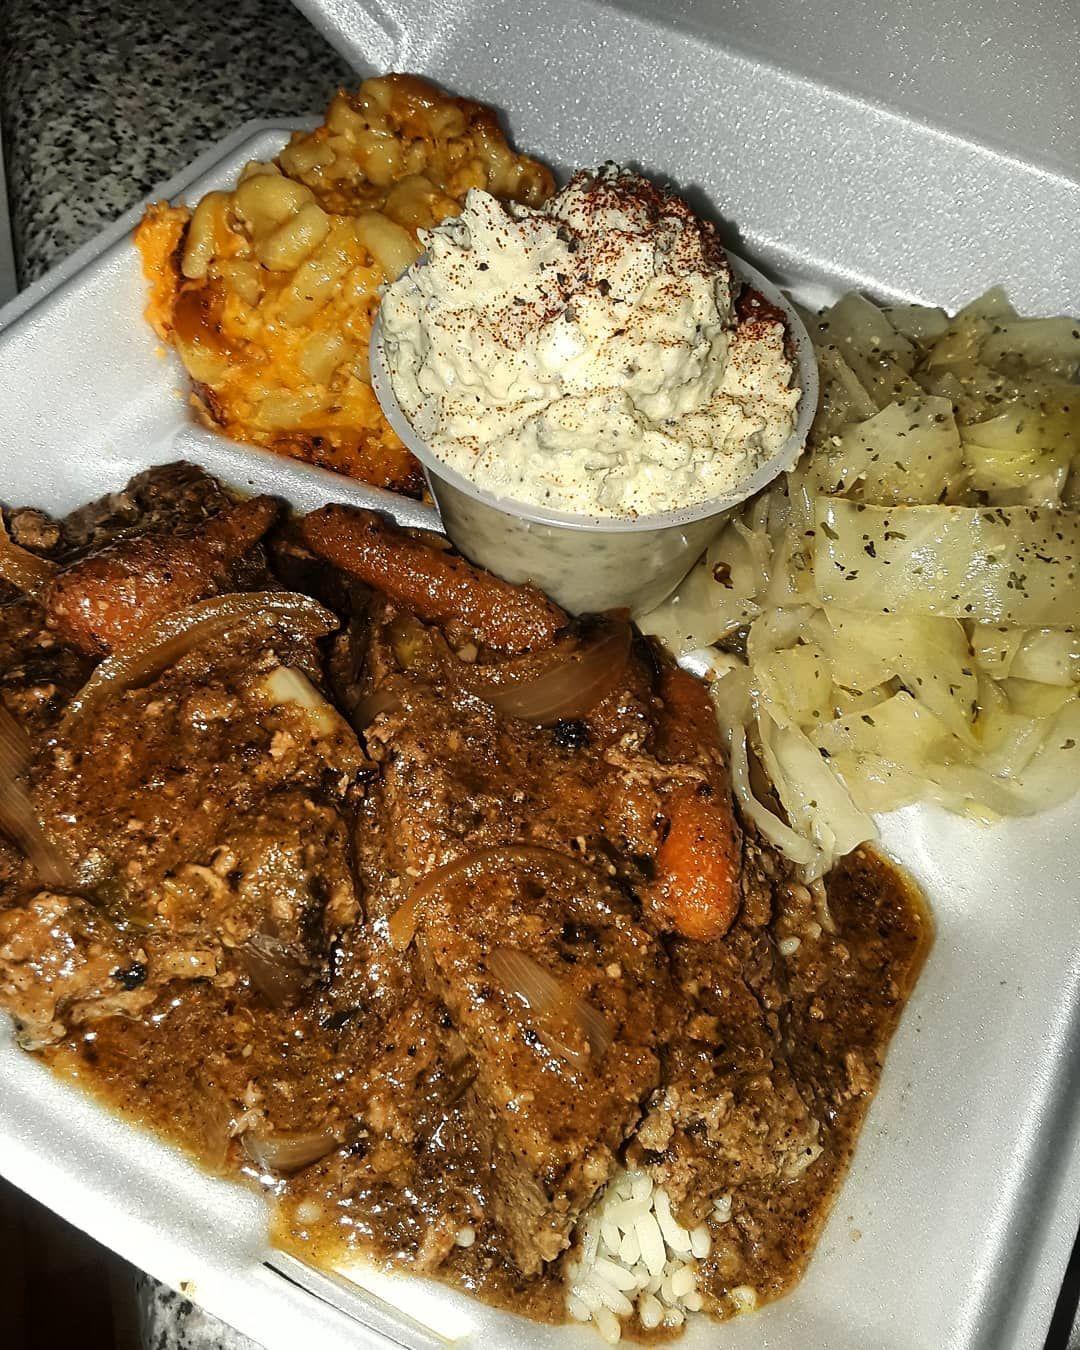 Griselda Blanco Tenille Barham On Instagram Turkey Meatloaf Issafoodfight Sisshaking Soul Food Dinner Soul Food Food Cravings